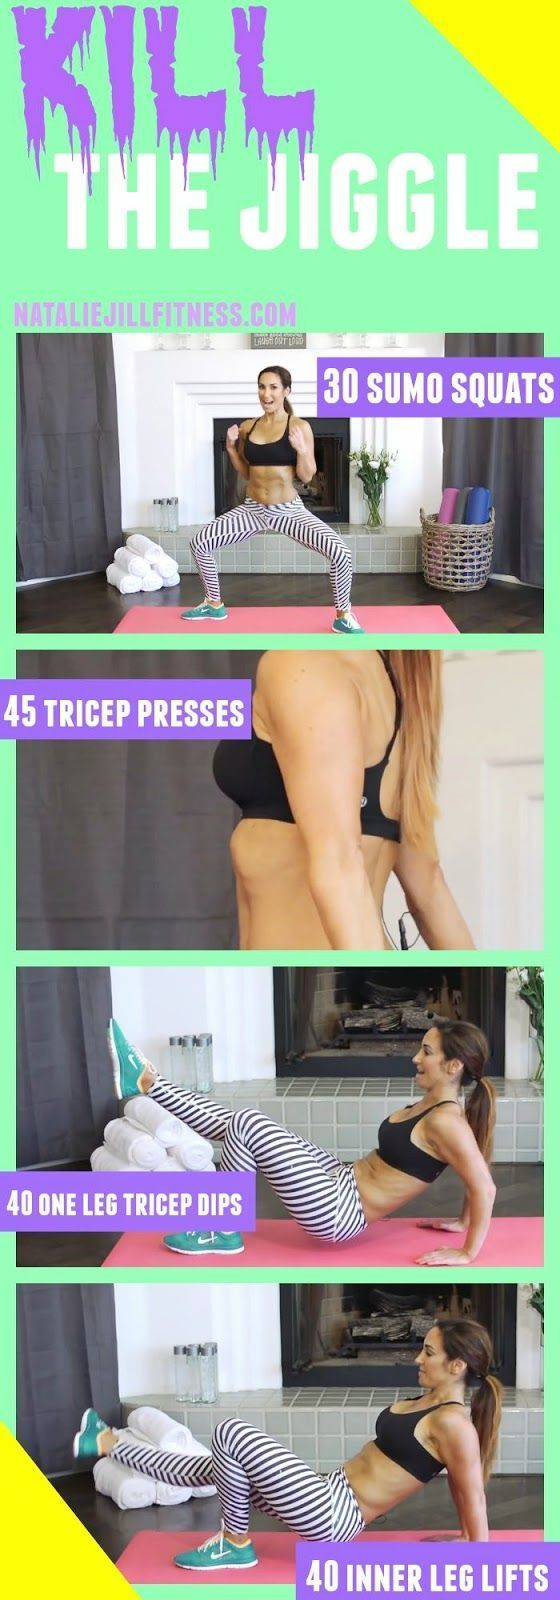 Kill The Jiggle Workout